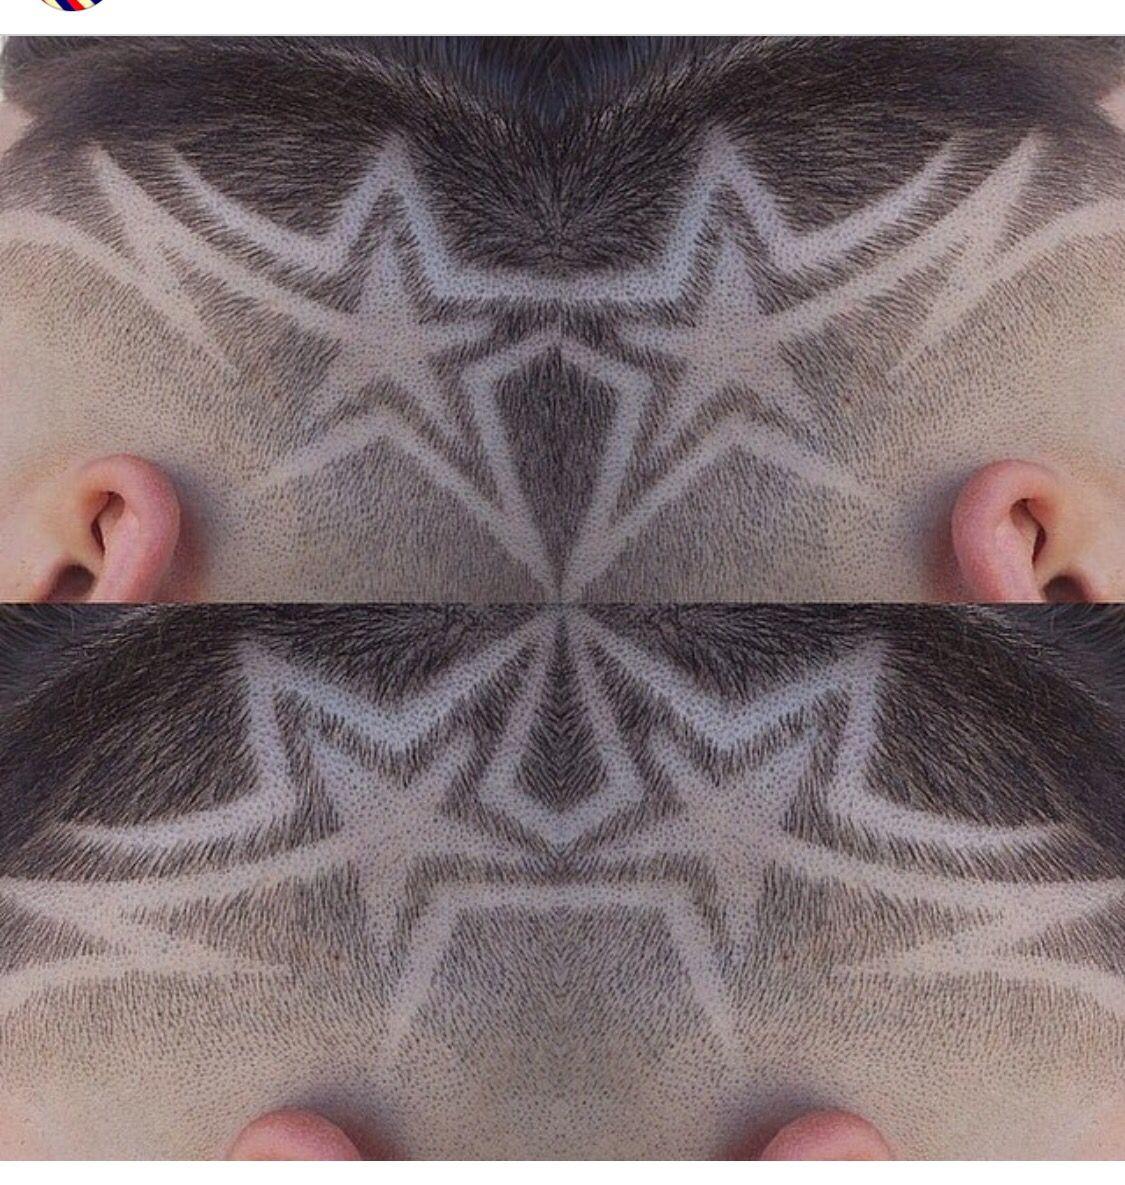 Star Design Shaved Hair Designs Hair Designs For Boys Hair Designs For Men